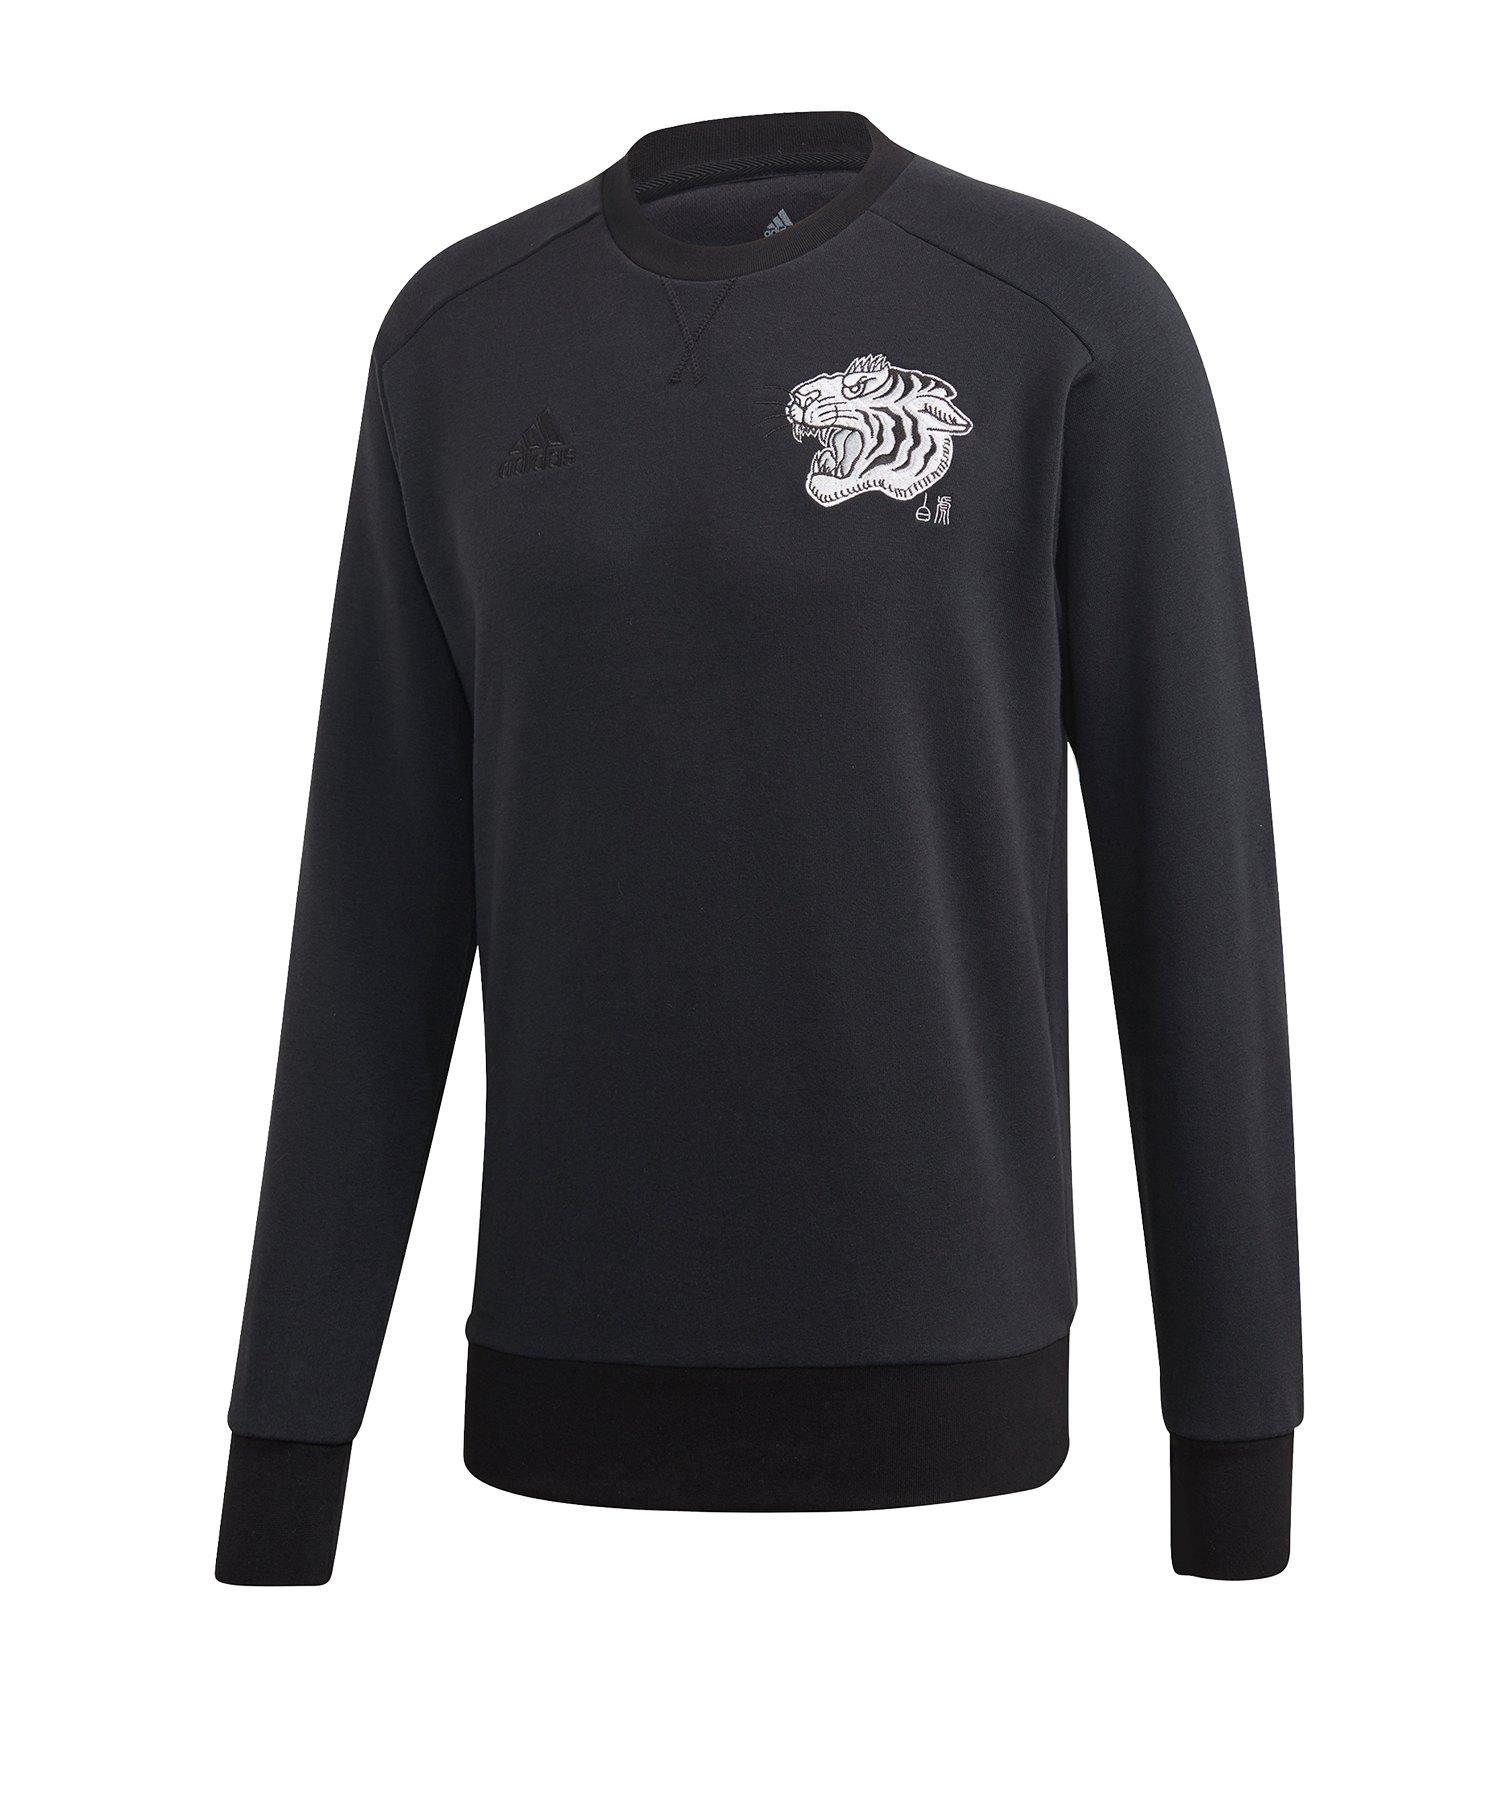 adidas Juventus Turin CNY Sweater Schwarz - schwarz